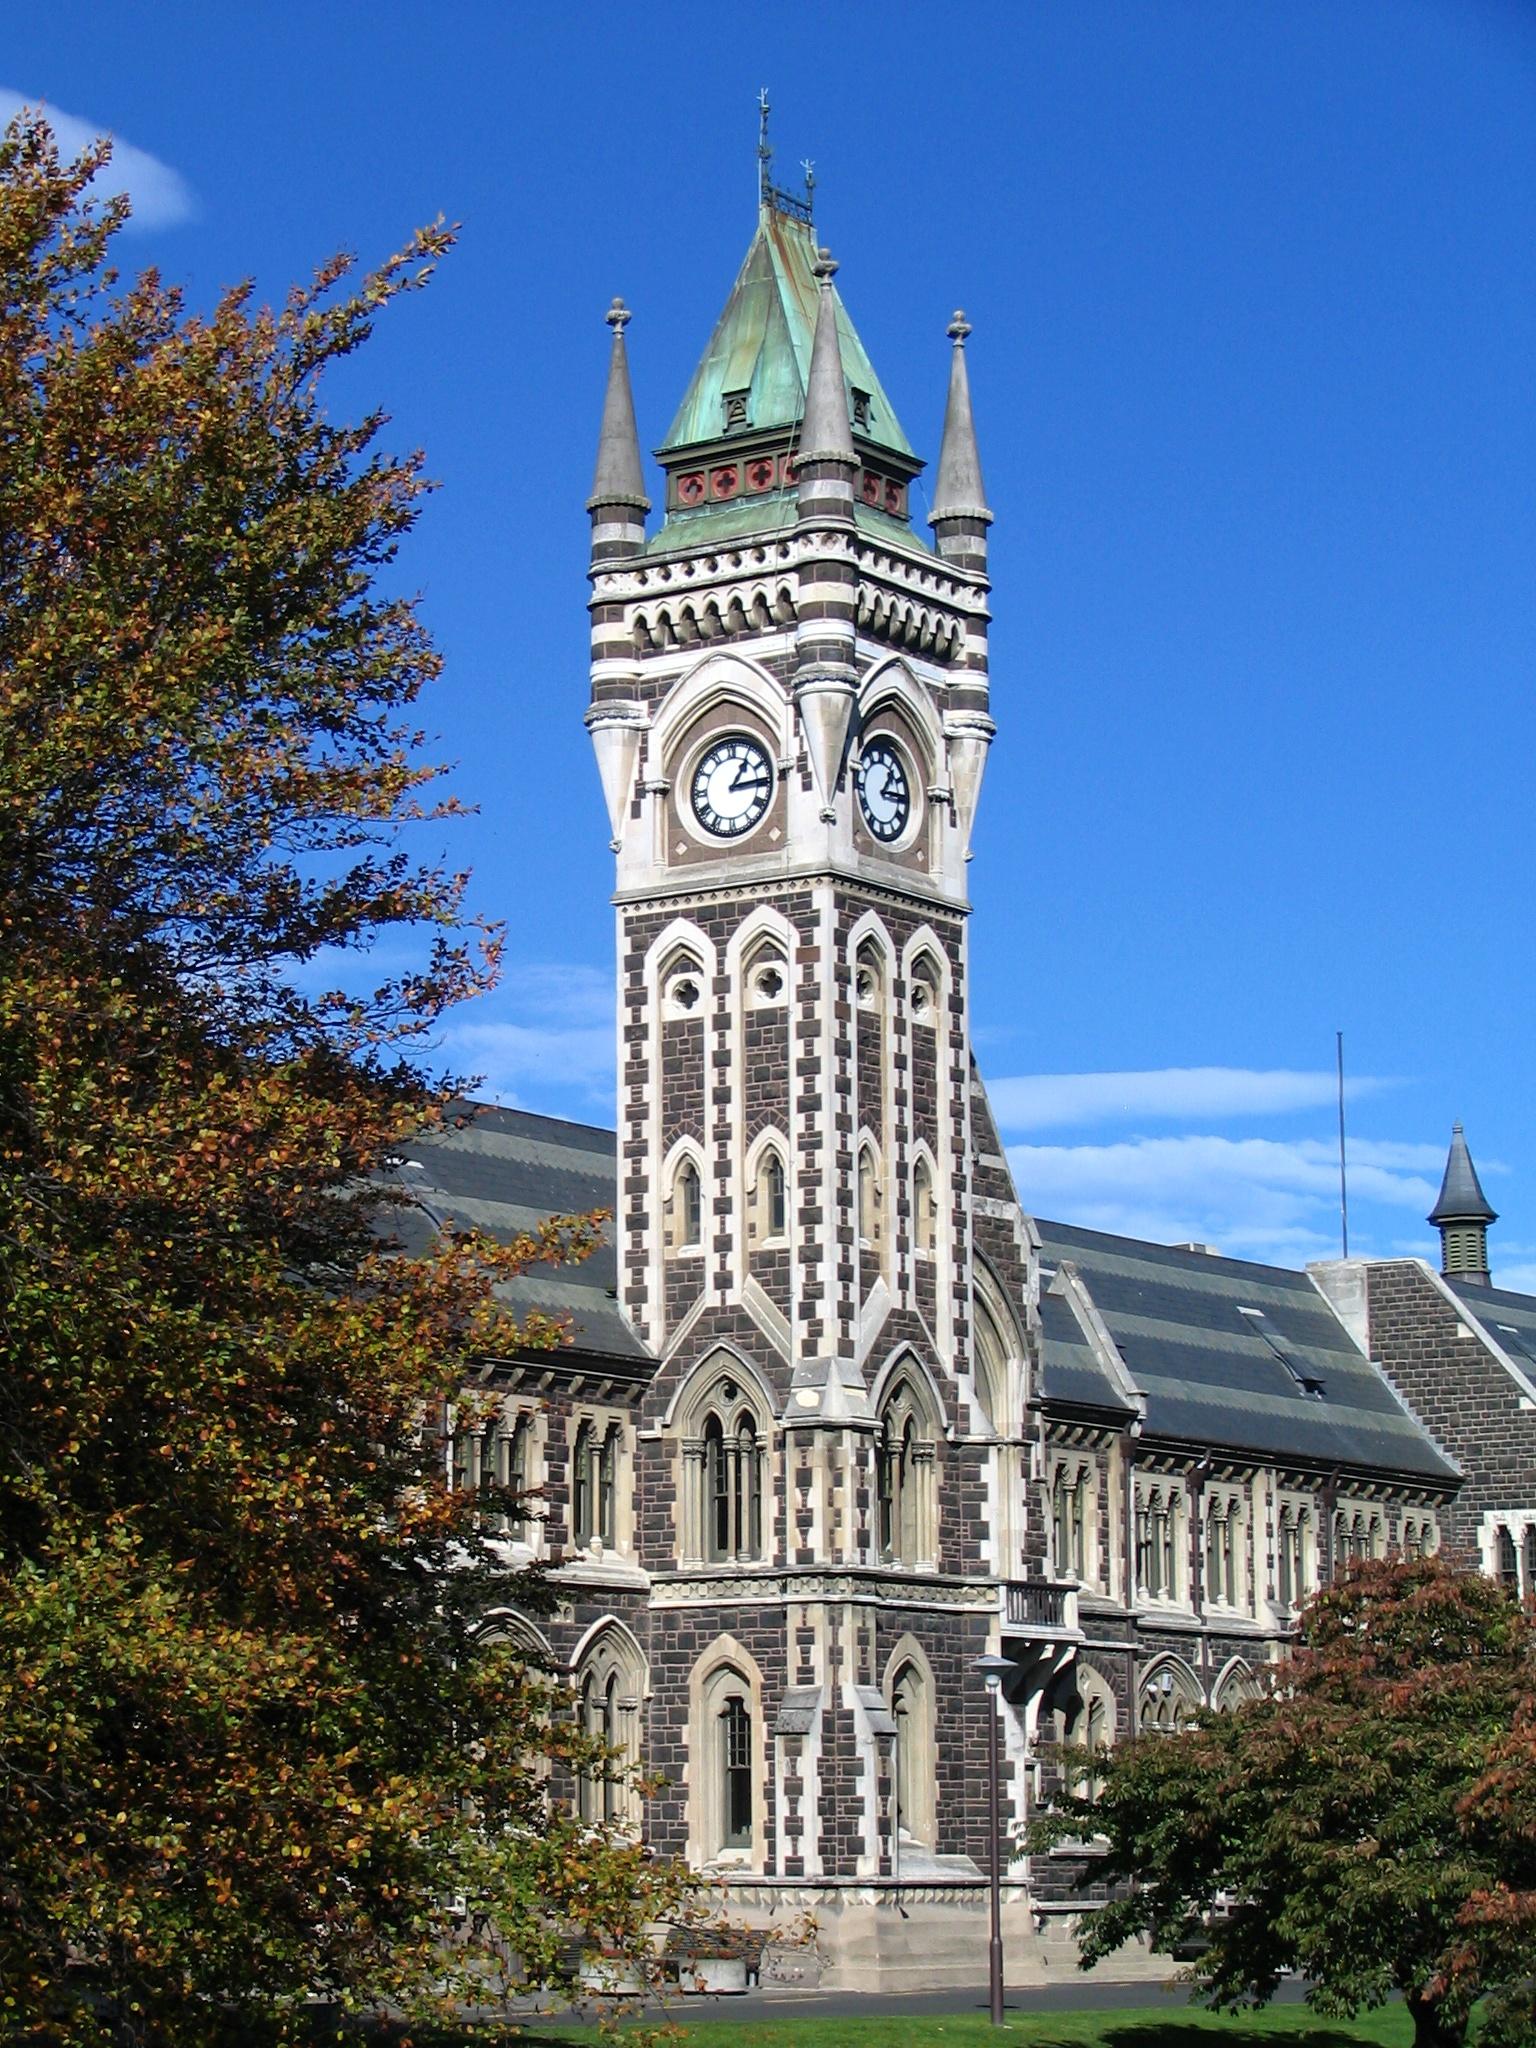 university otago clock tower wikipedia motto wānanga building2 registry wiki